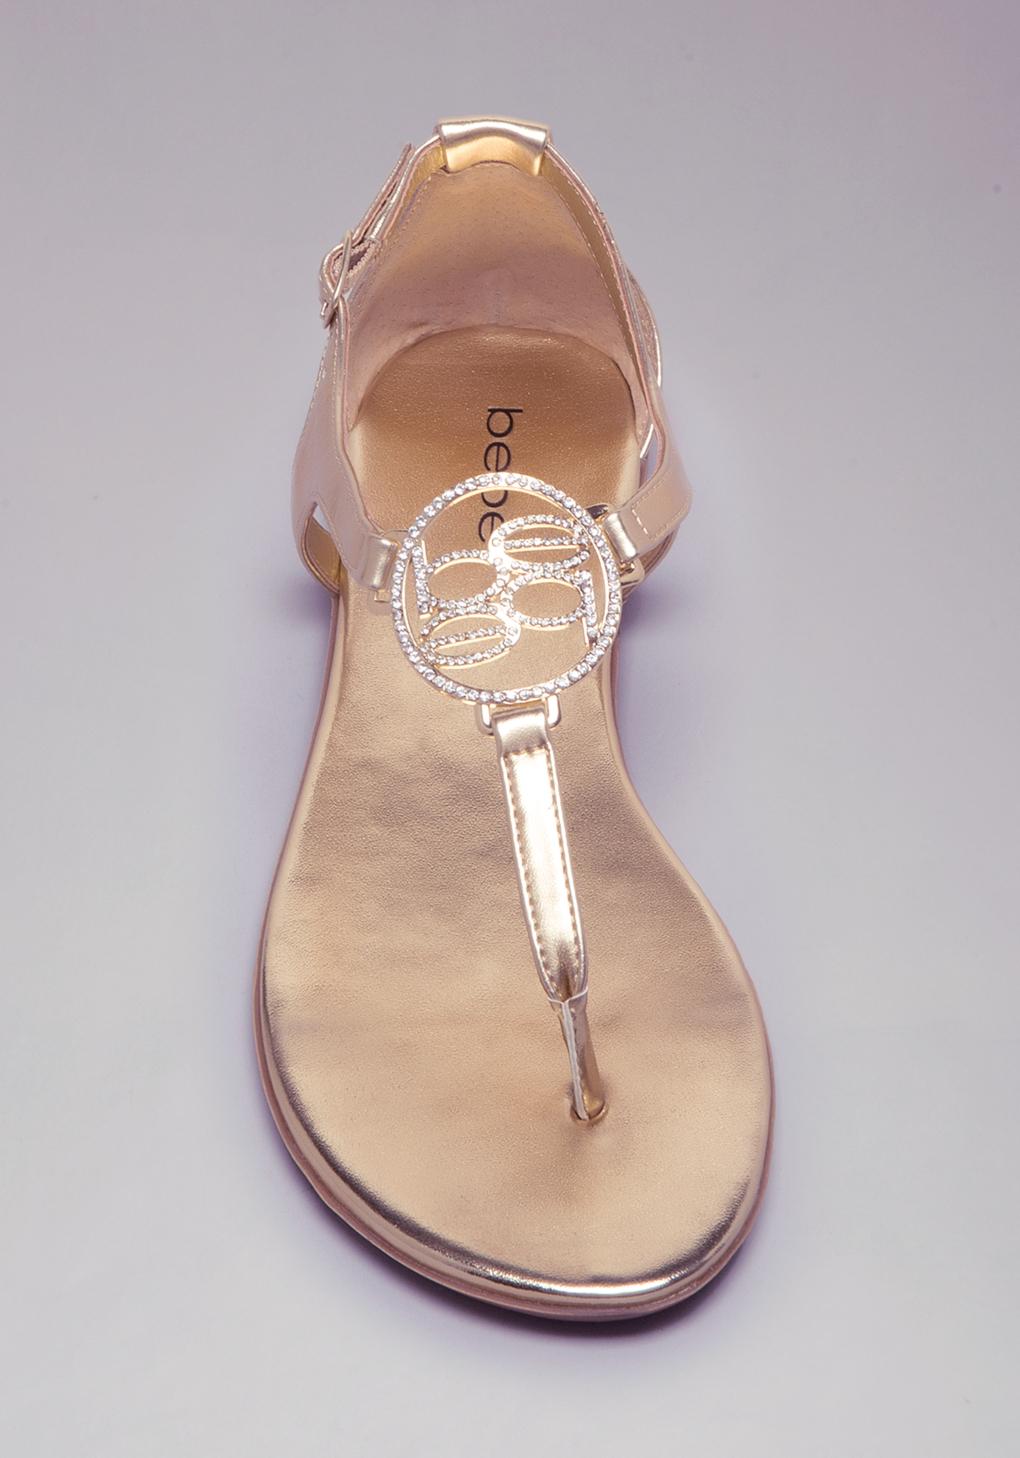 261749a6bec196 Lyst - Bebe Brielle Logo Flat Sandals in Metallic